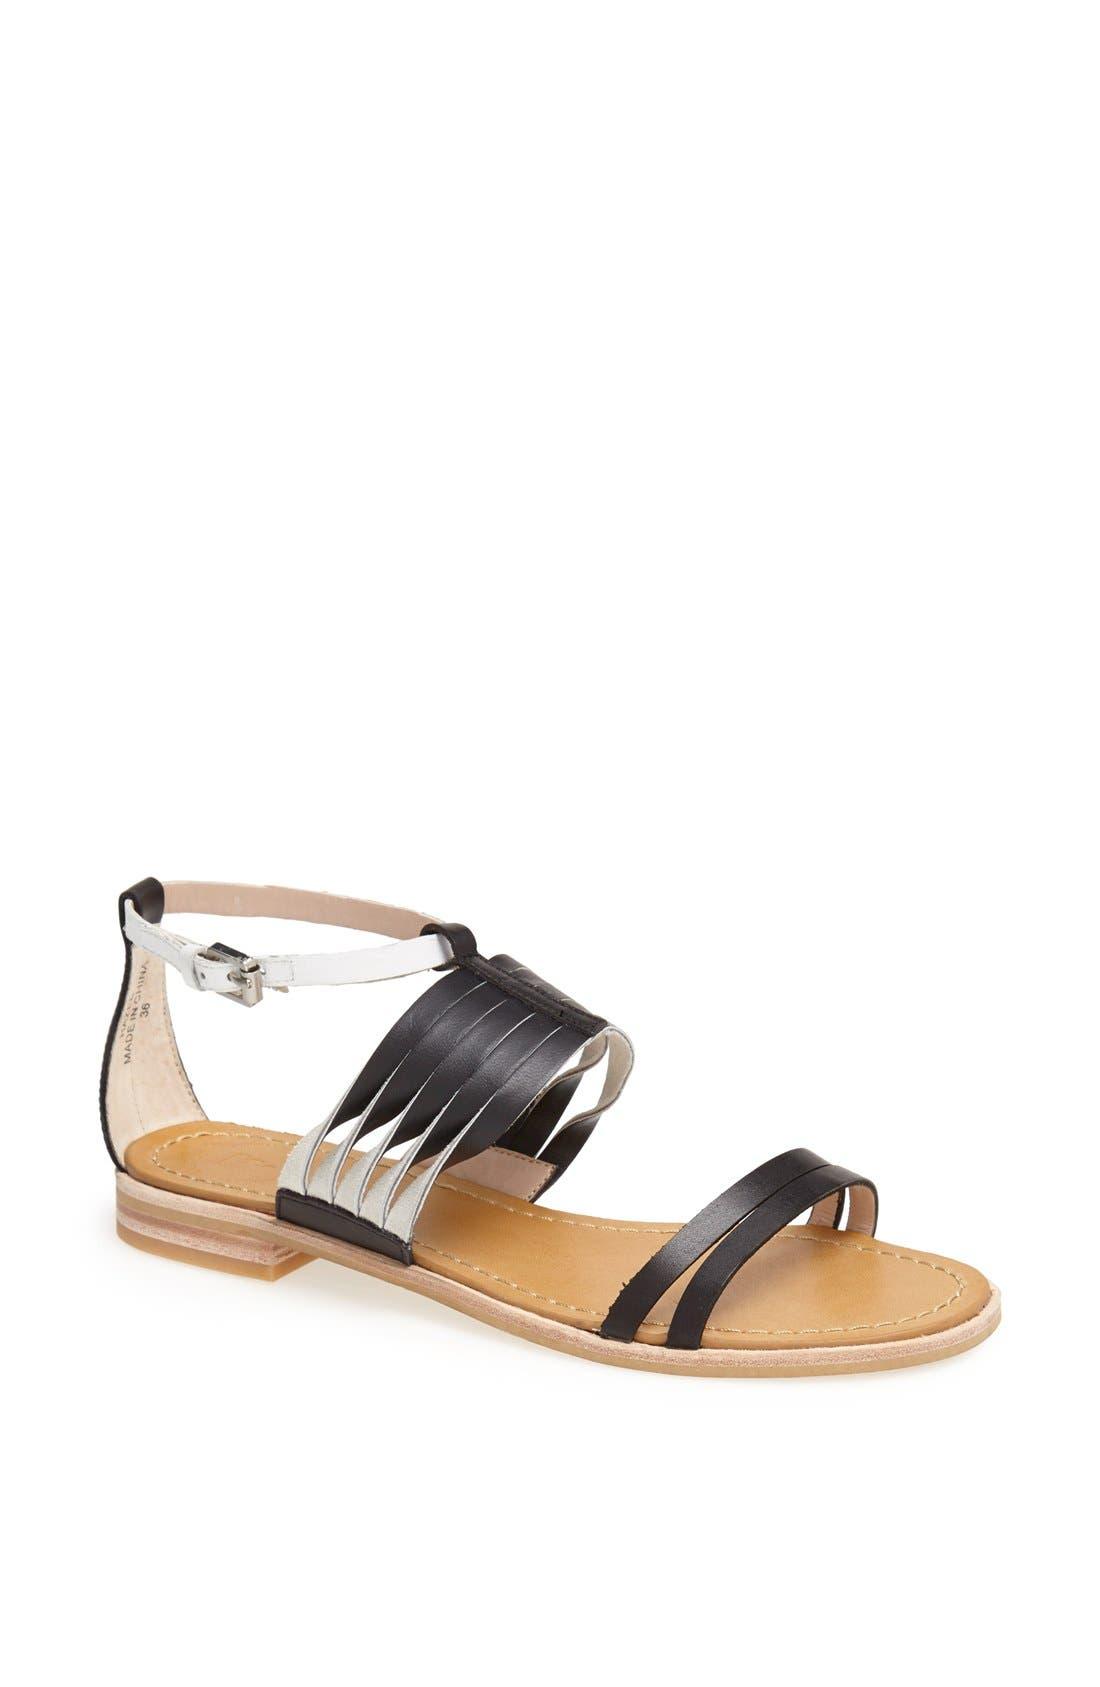 Alternate Image 1 Selected - French Connection 'Hazel' Sandal